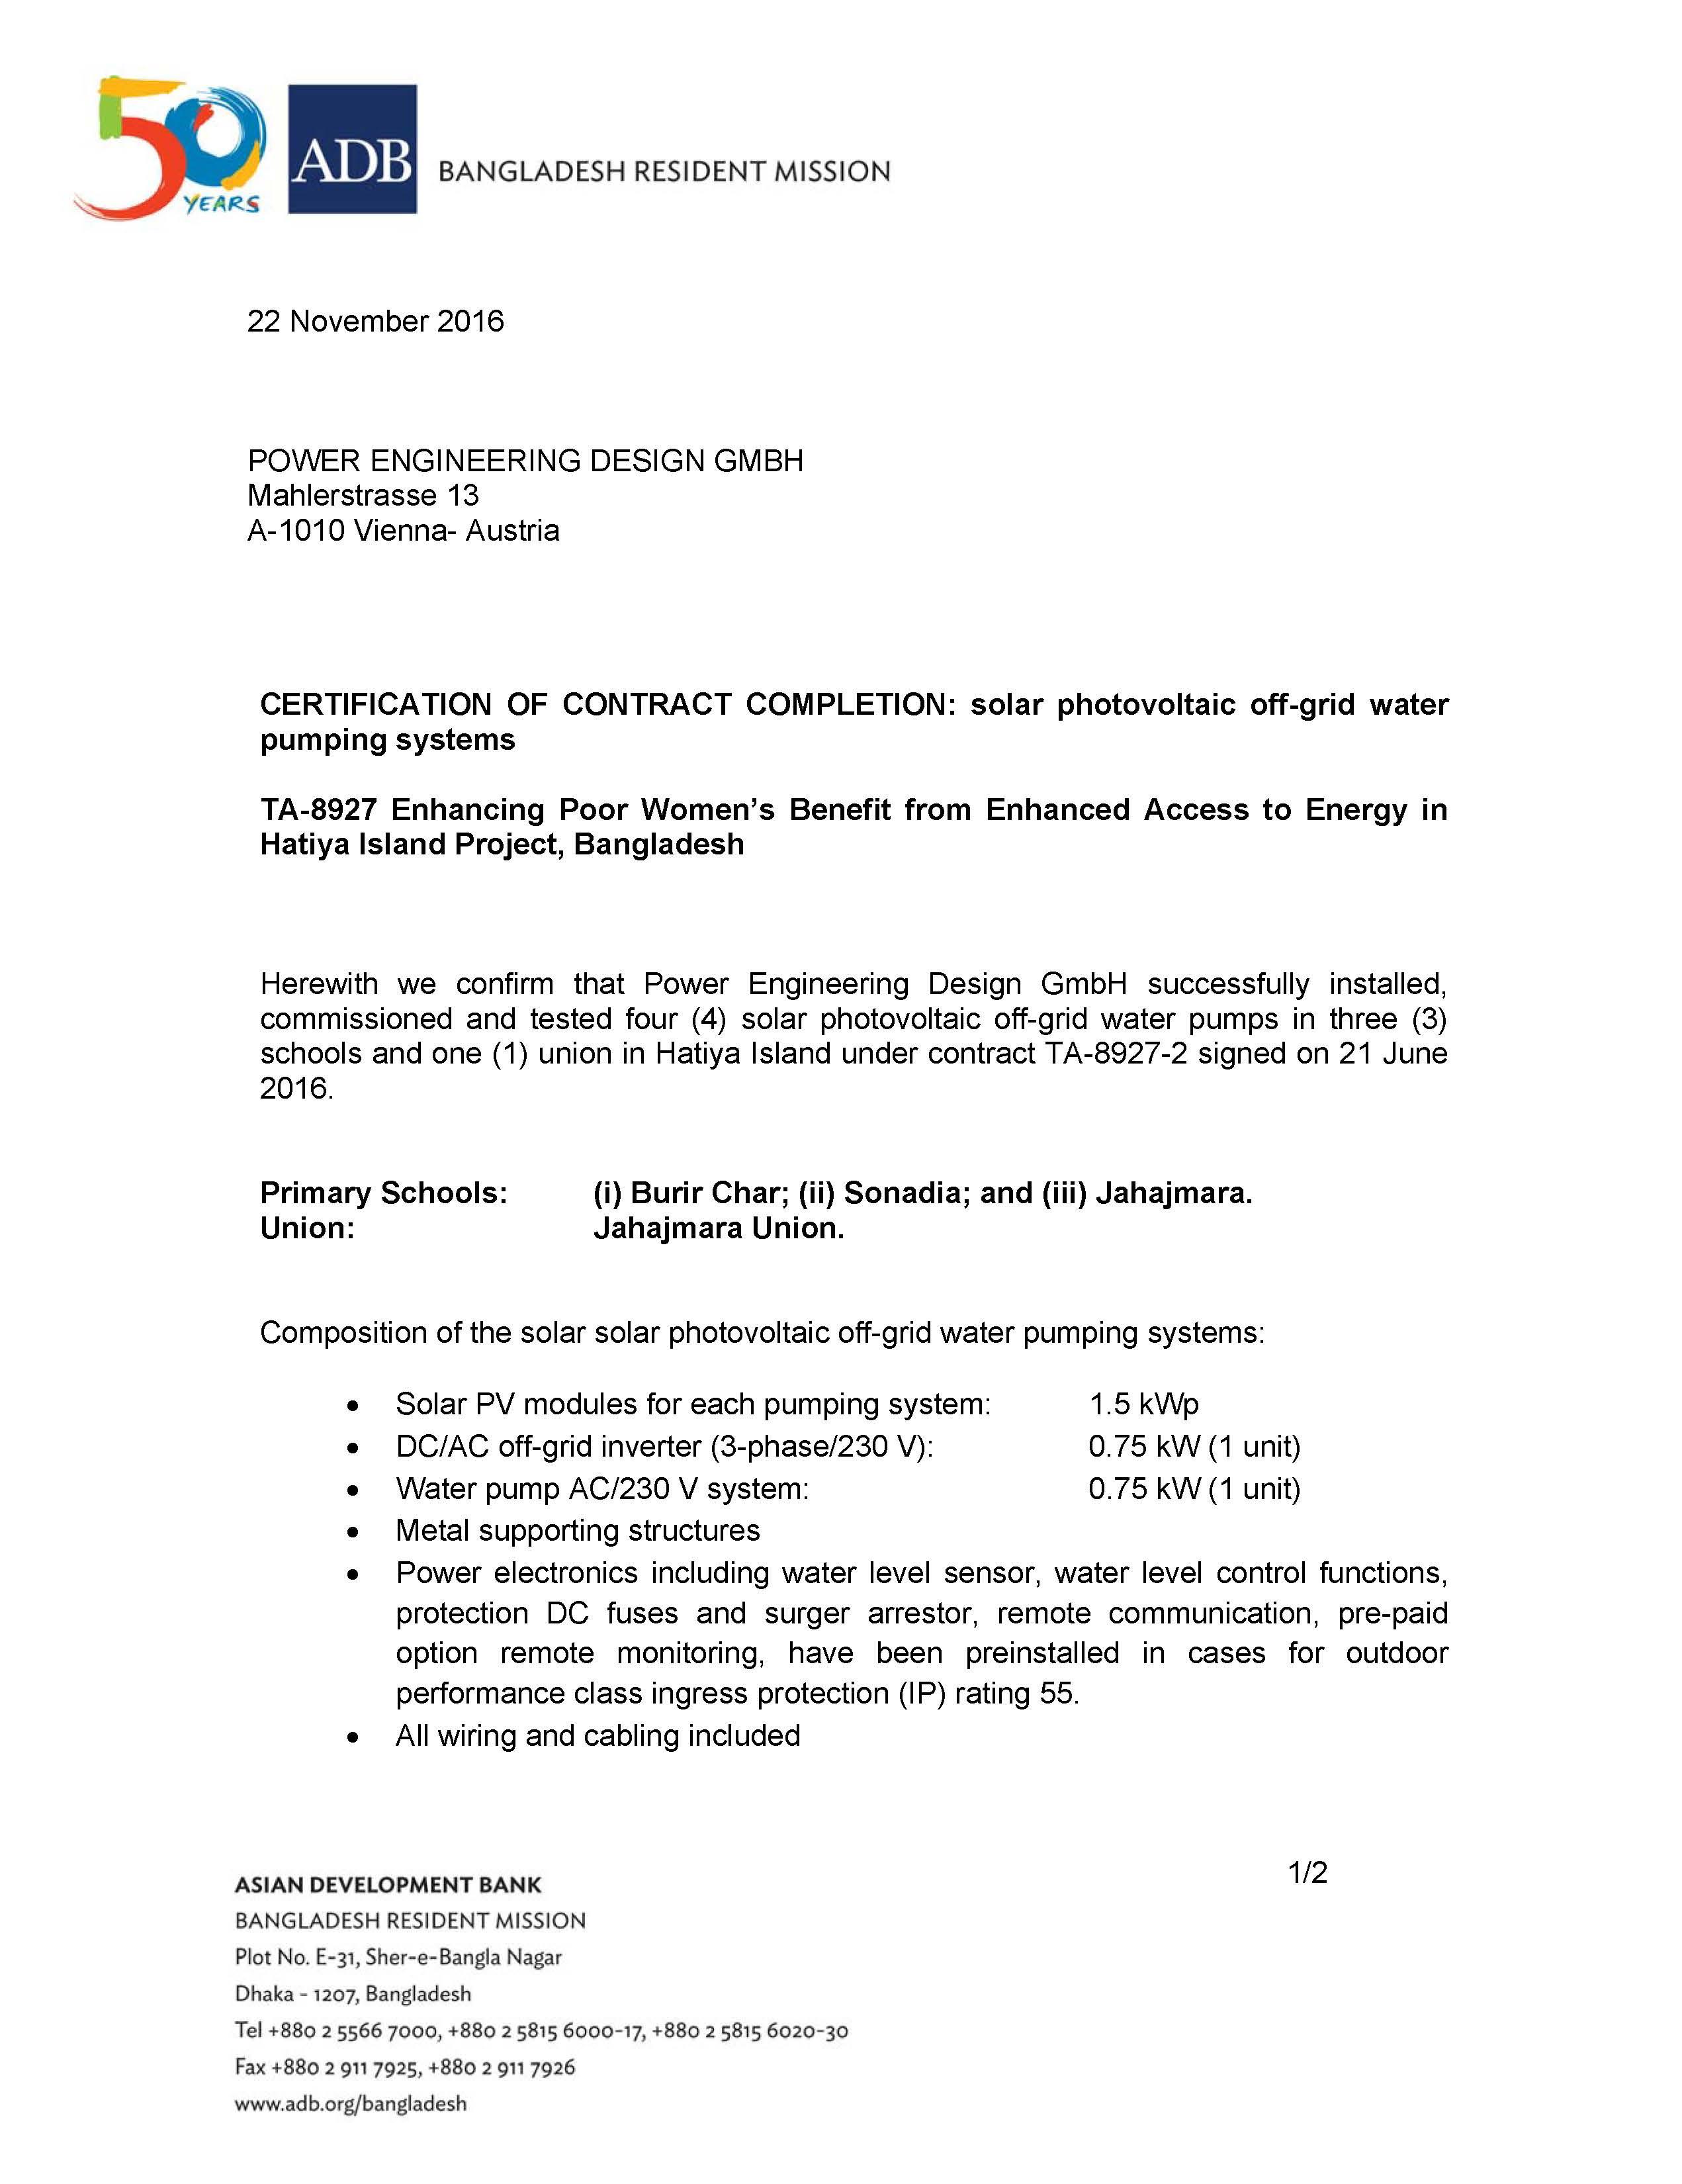 ped-certificate-of-pvpump-hatiya-22-11-16_page_1